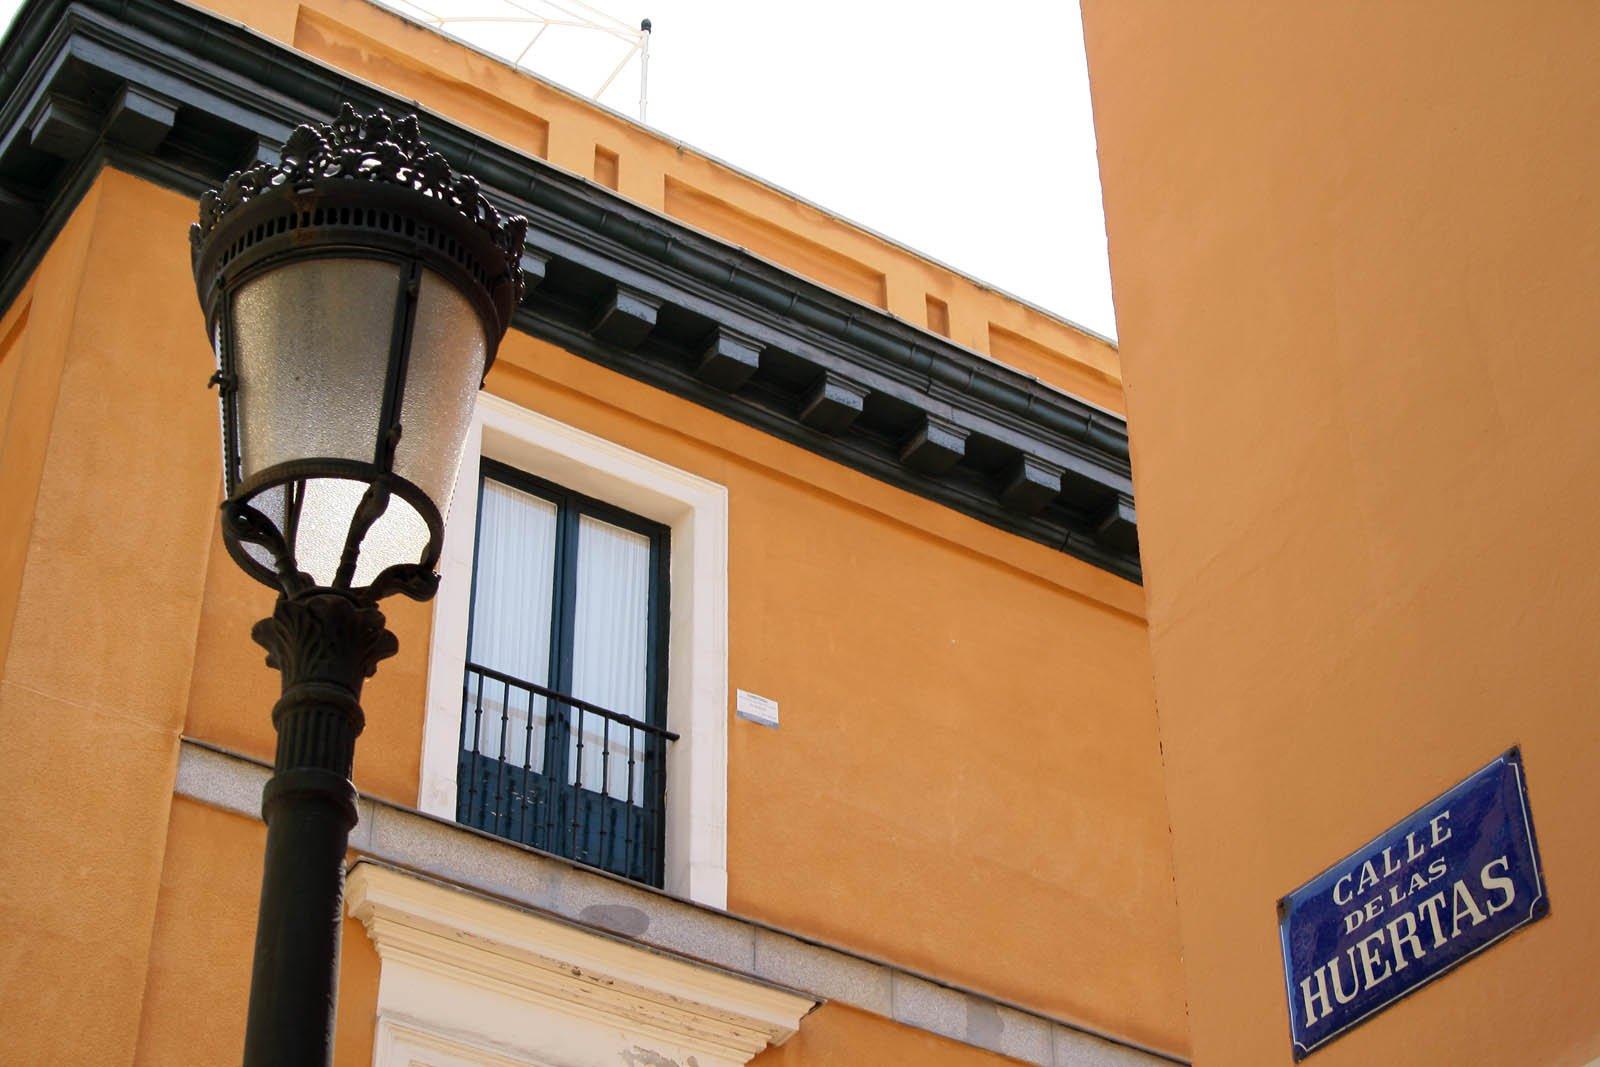 Calle Huertas street sign